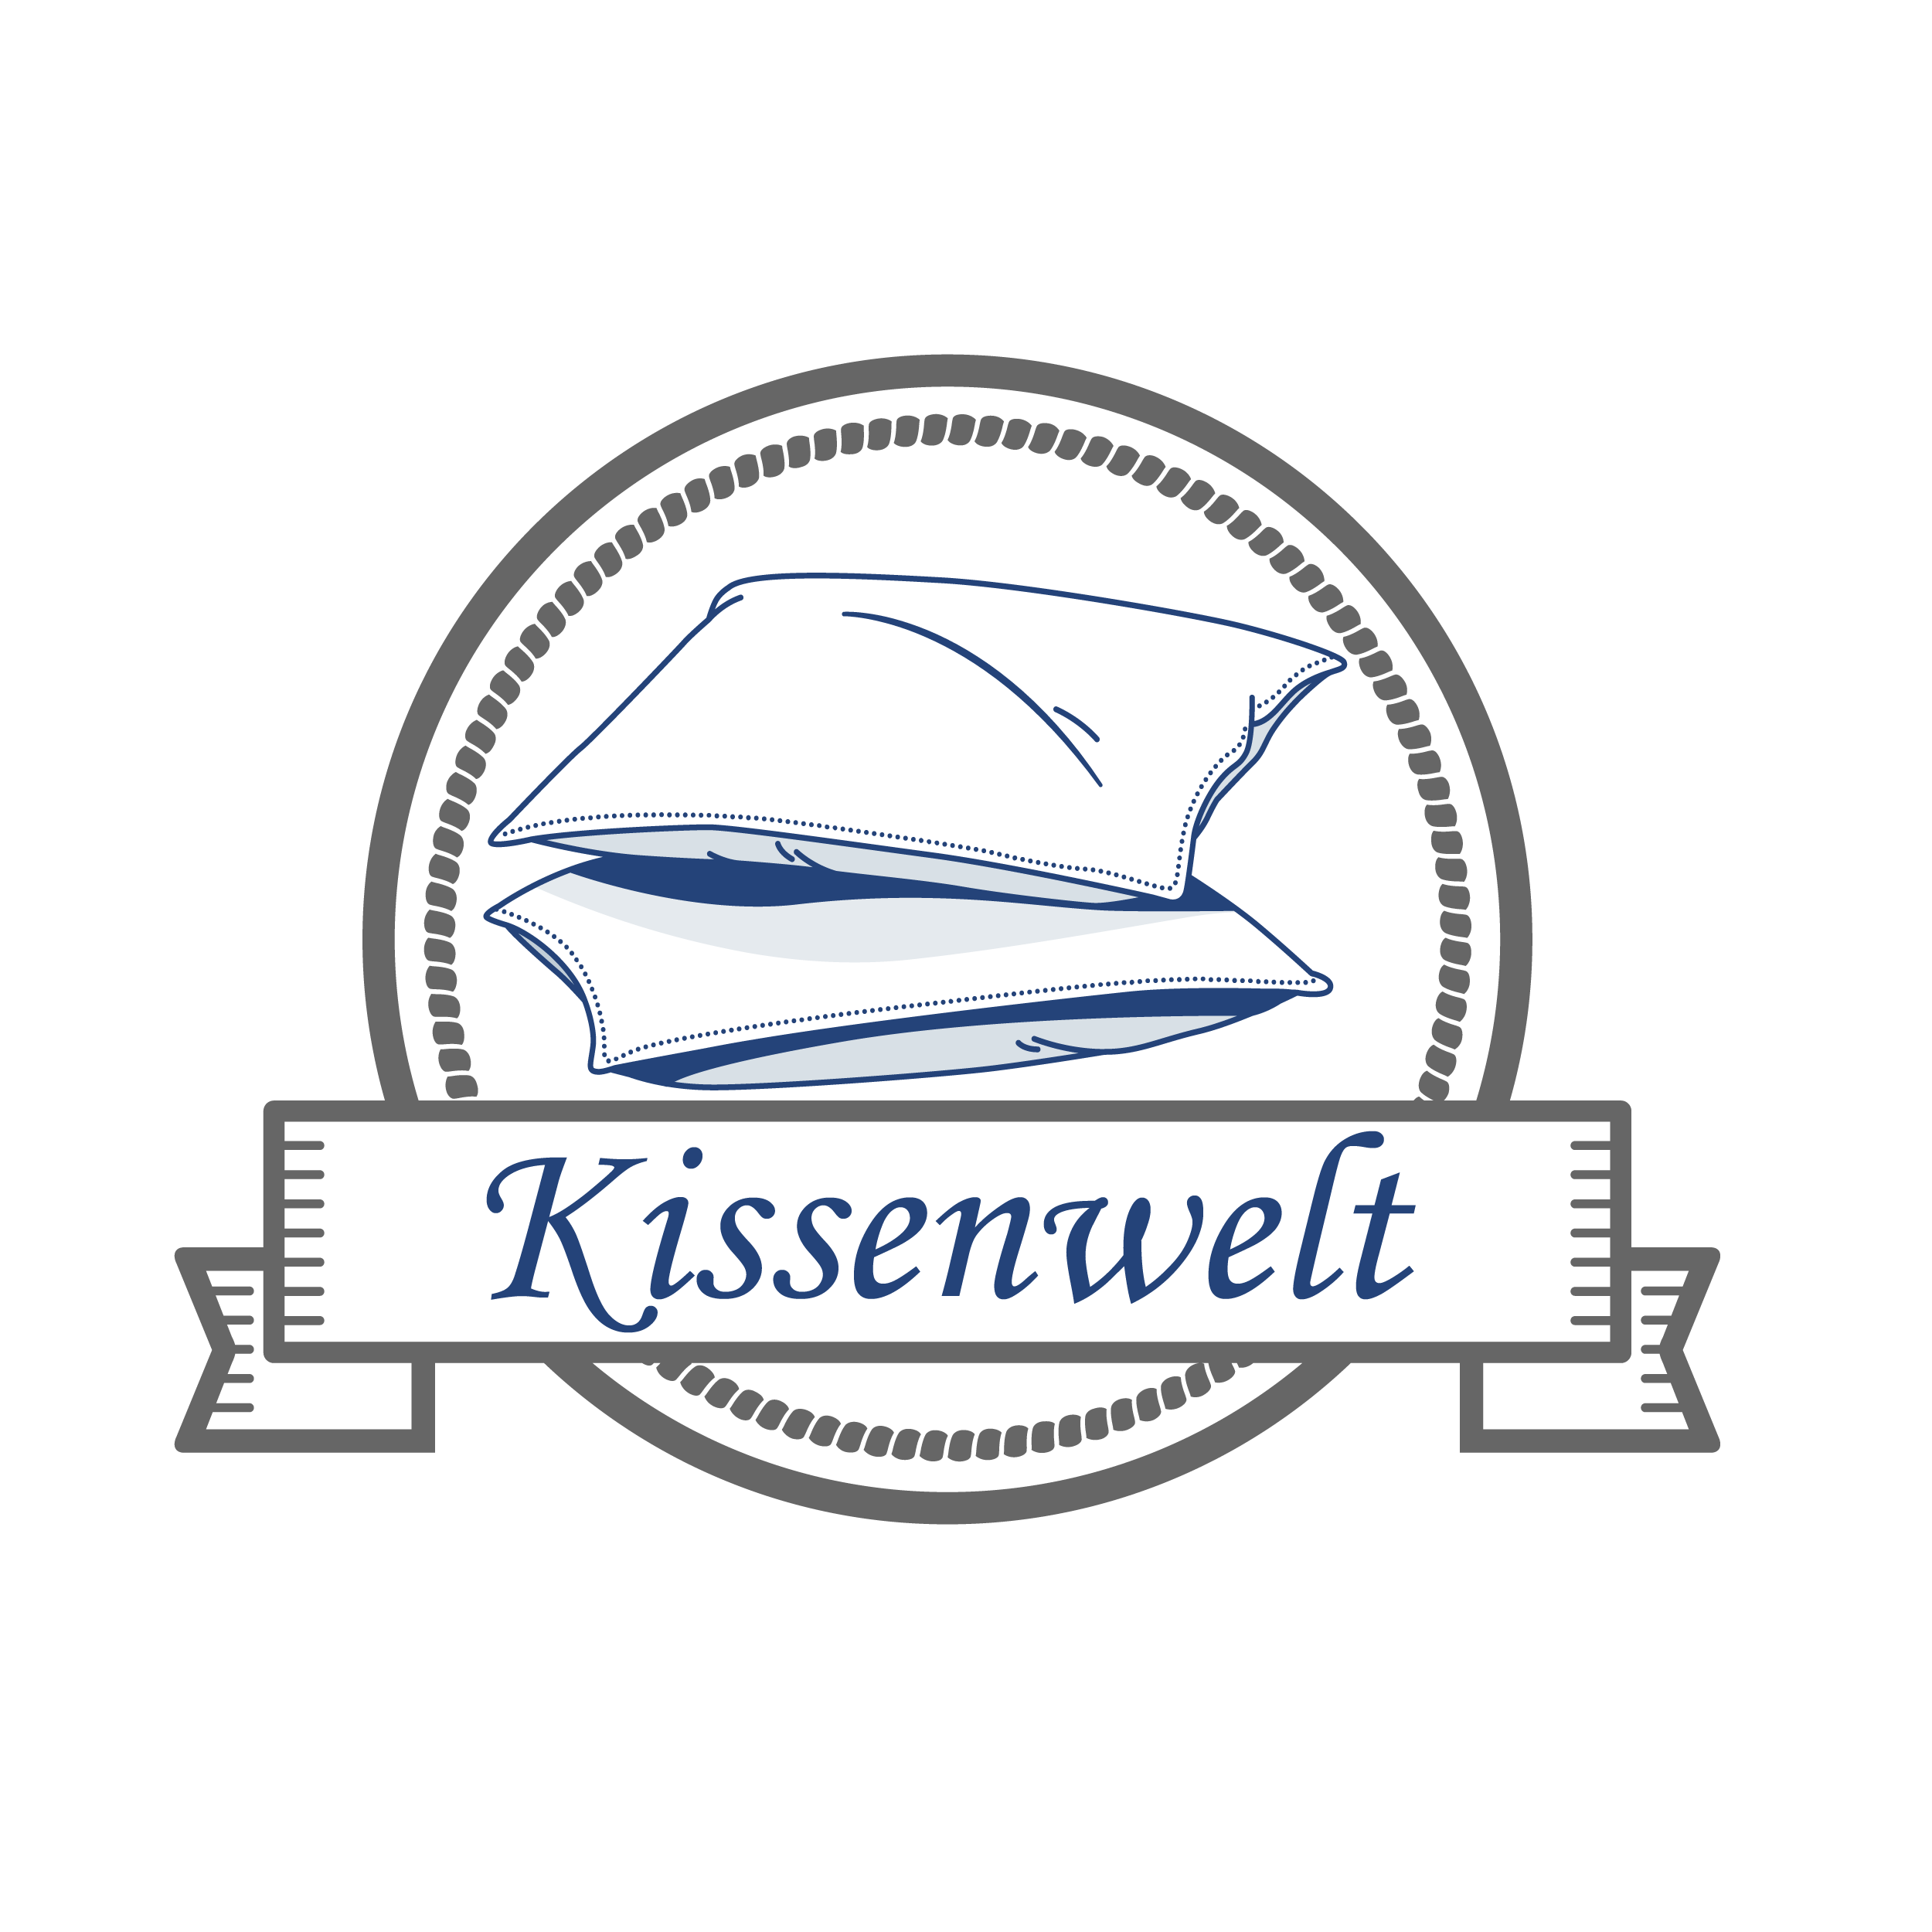 Kissenwelt